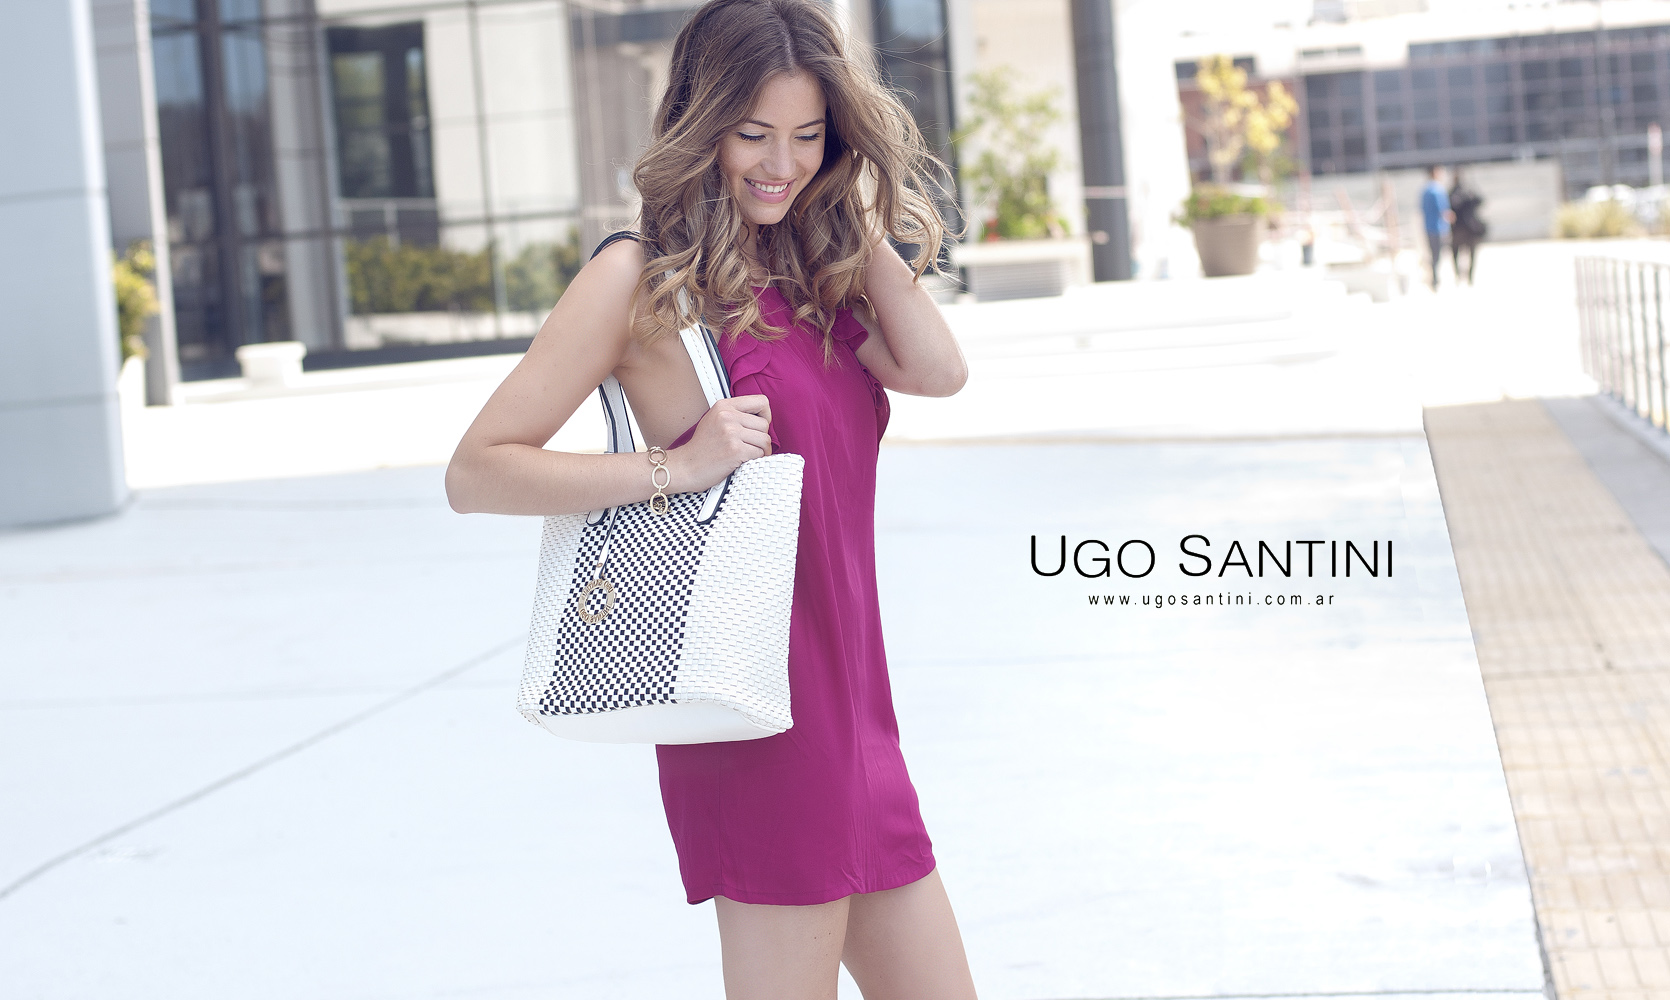 Ugo santini S 04